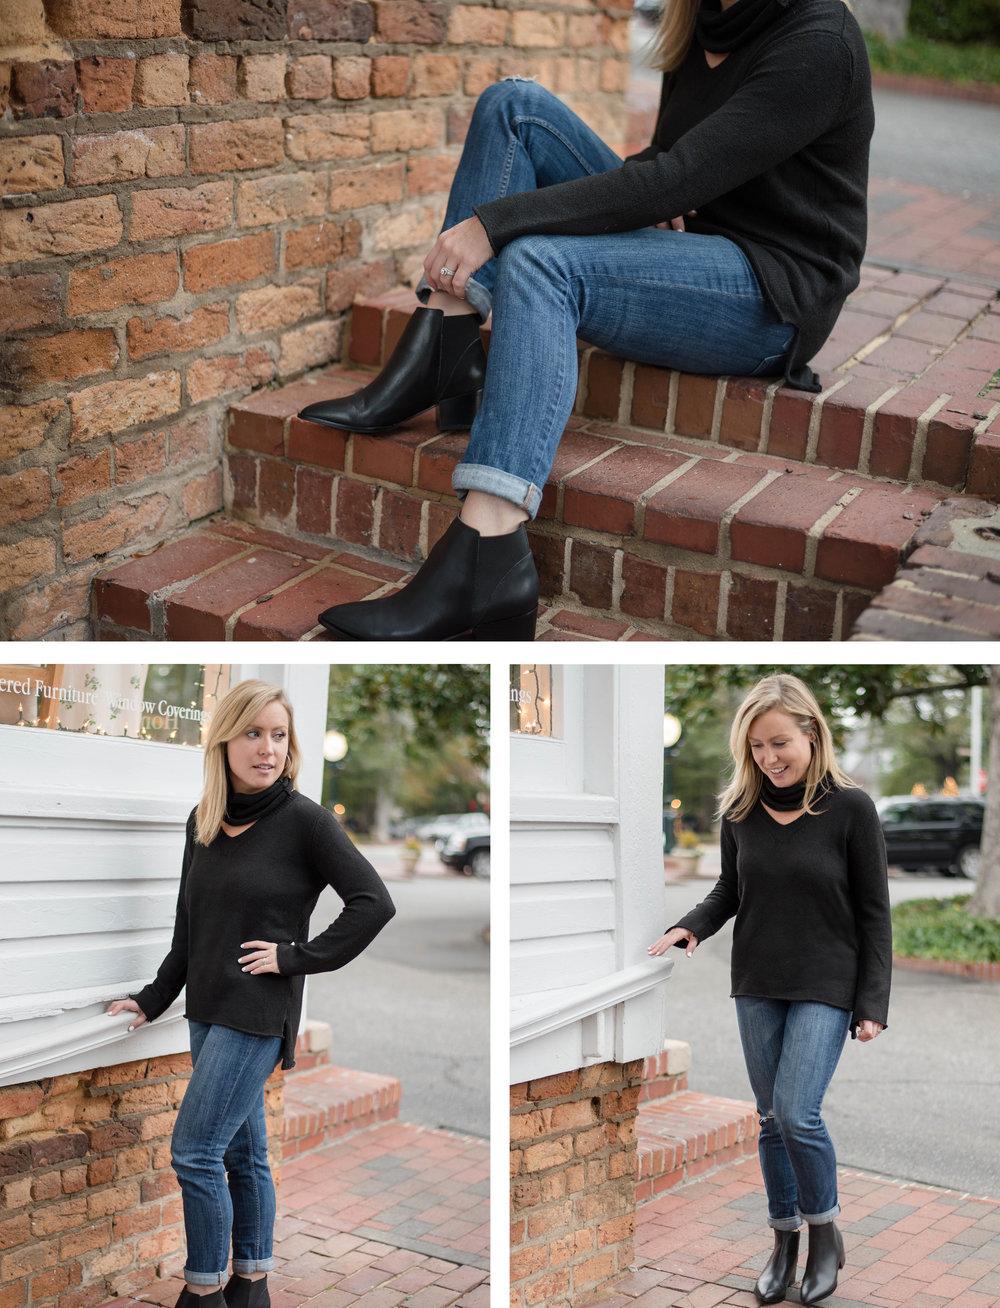 Cooper and Baileys_Fashion Photography_3.jpg